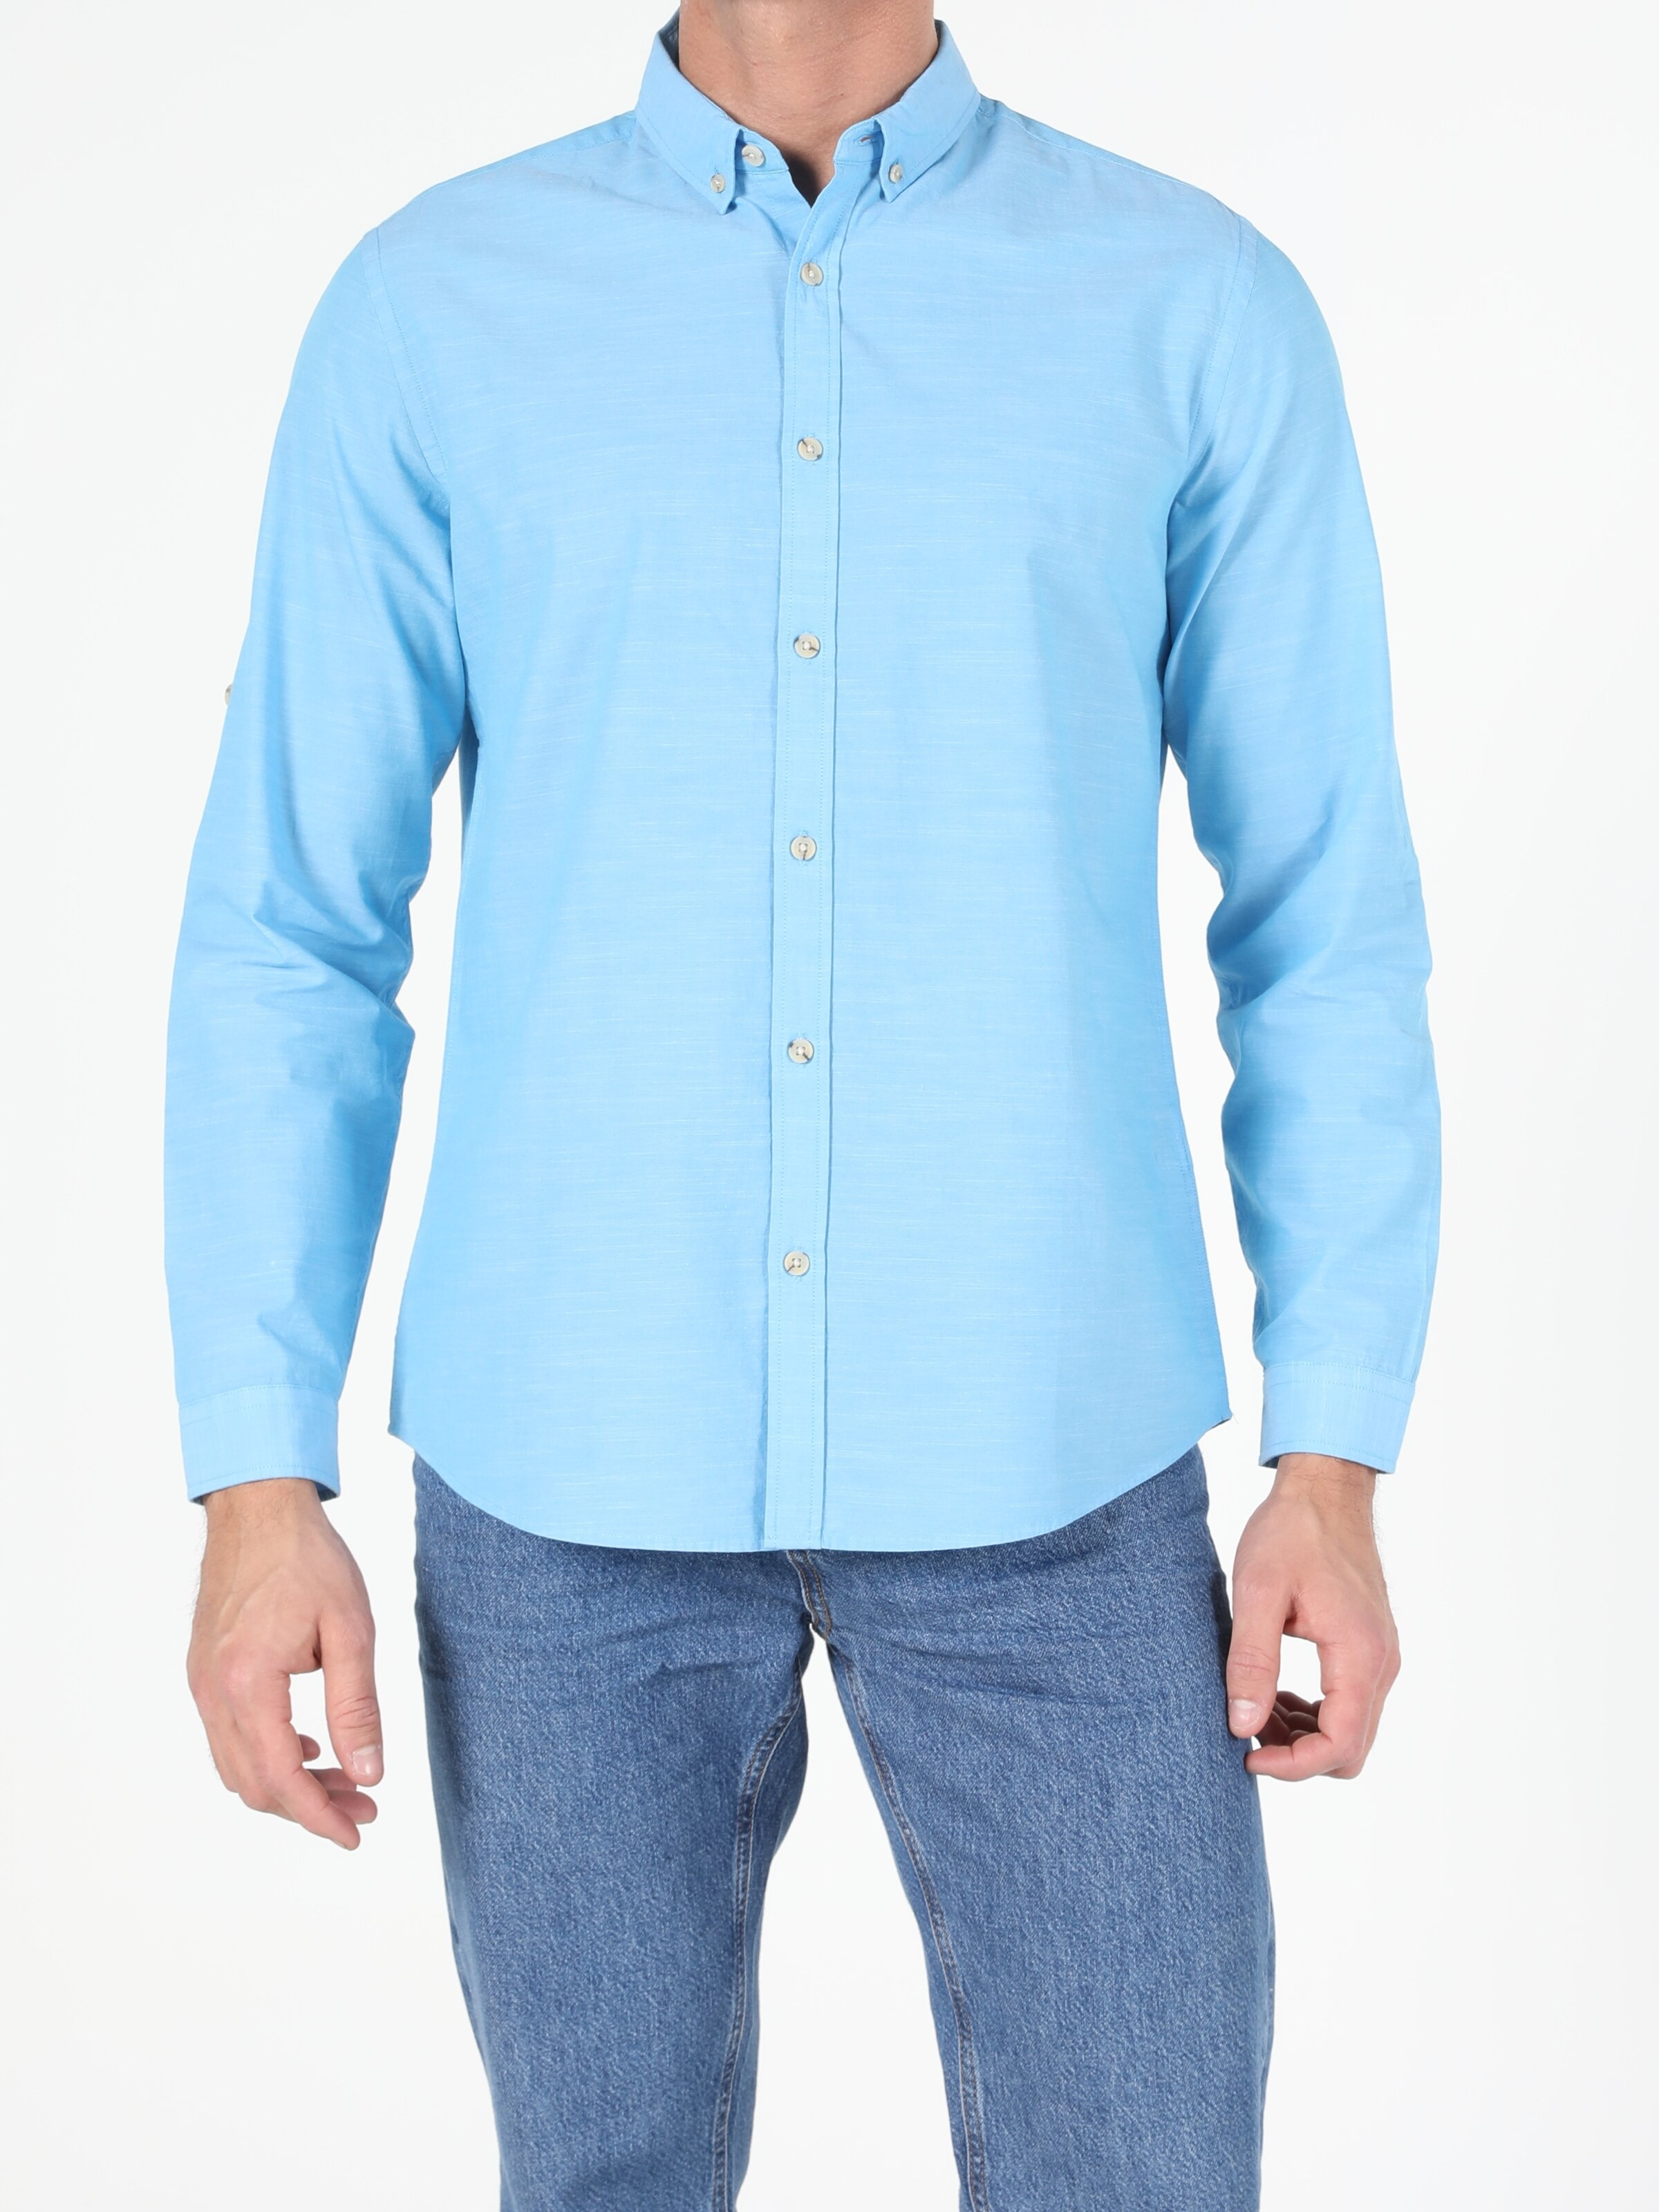 Regular Fit Shirt Neck Erkek Açık Mavi Uzun Kol Gömlek